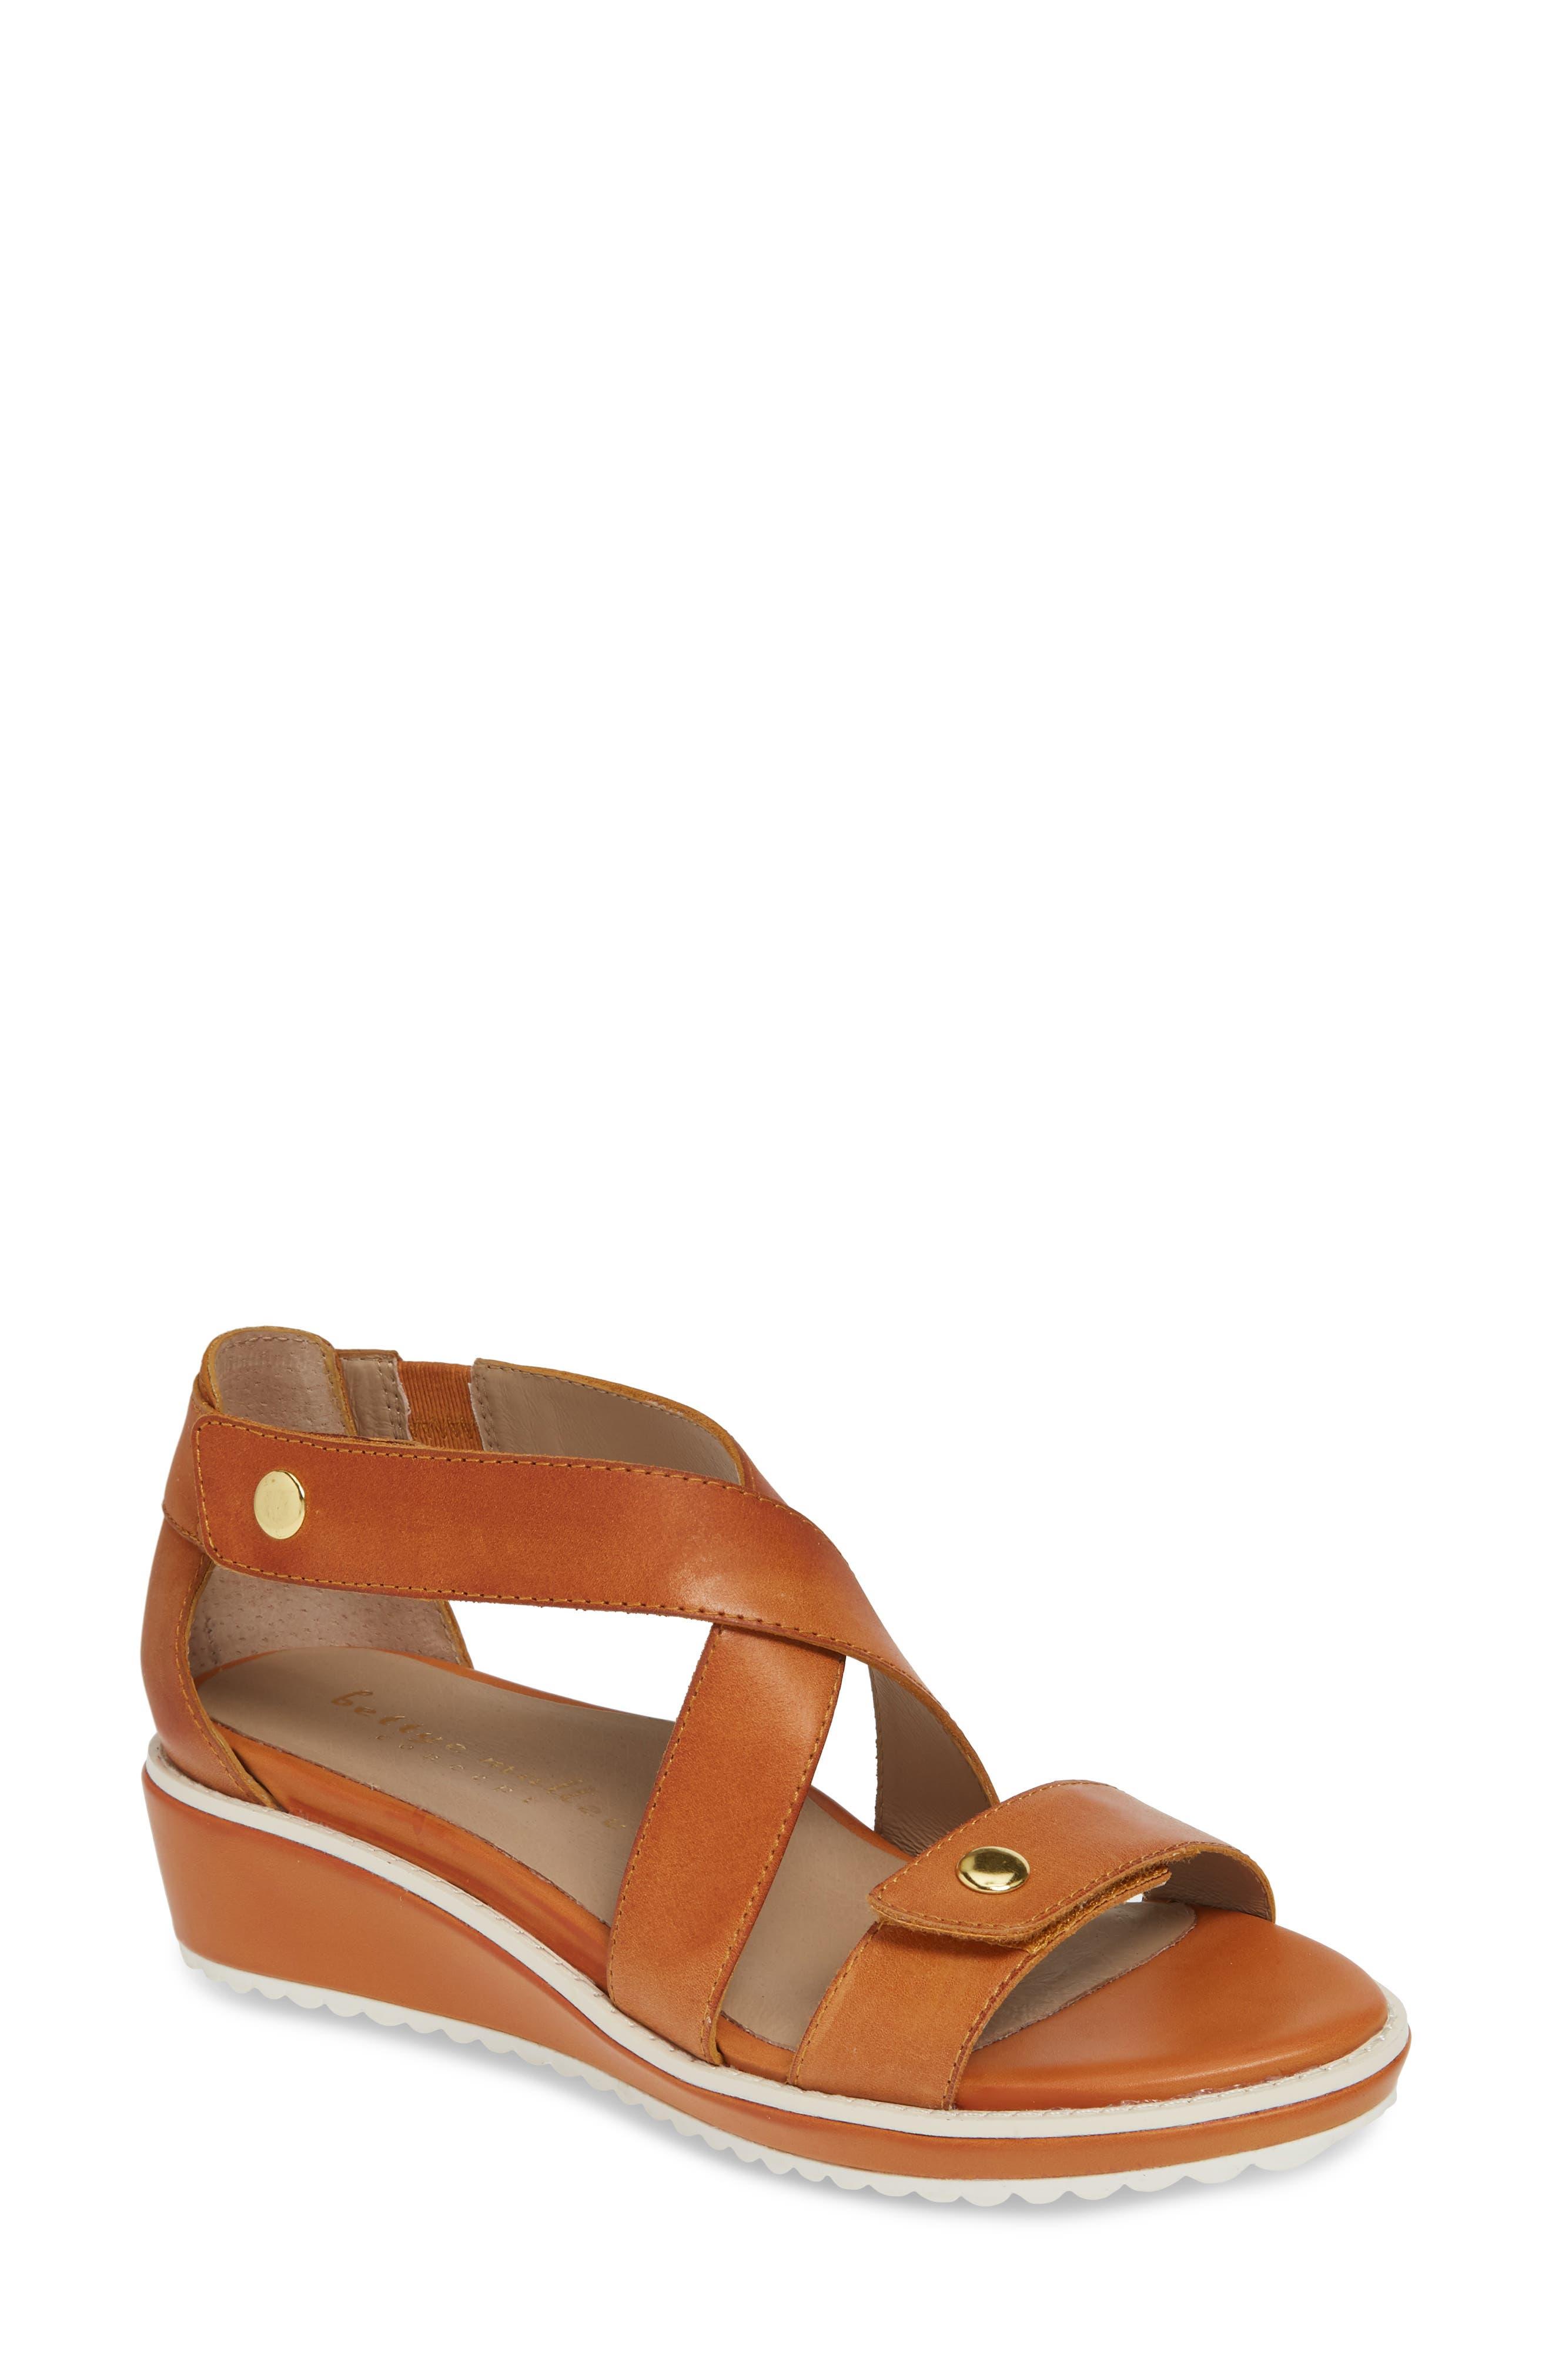 Bettye Muller Concepts Tobi Wedge Sandal, Yellow